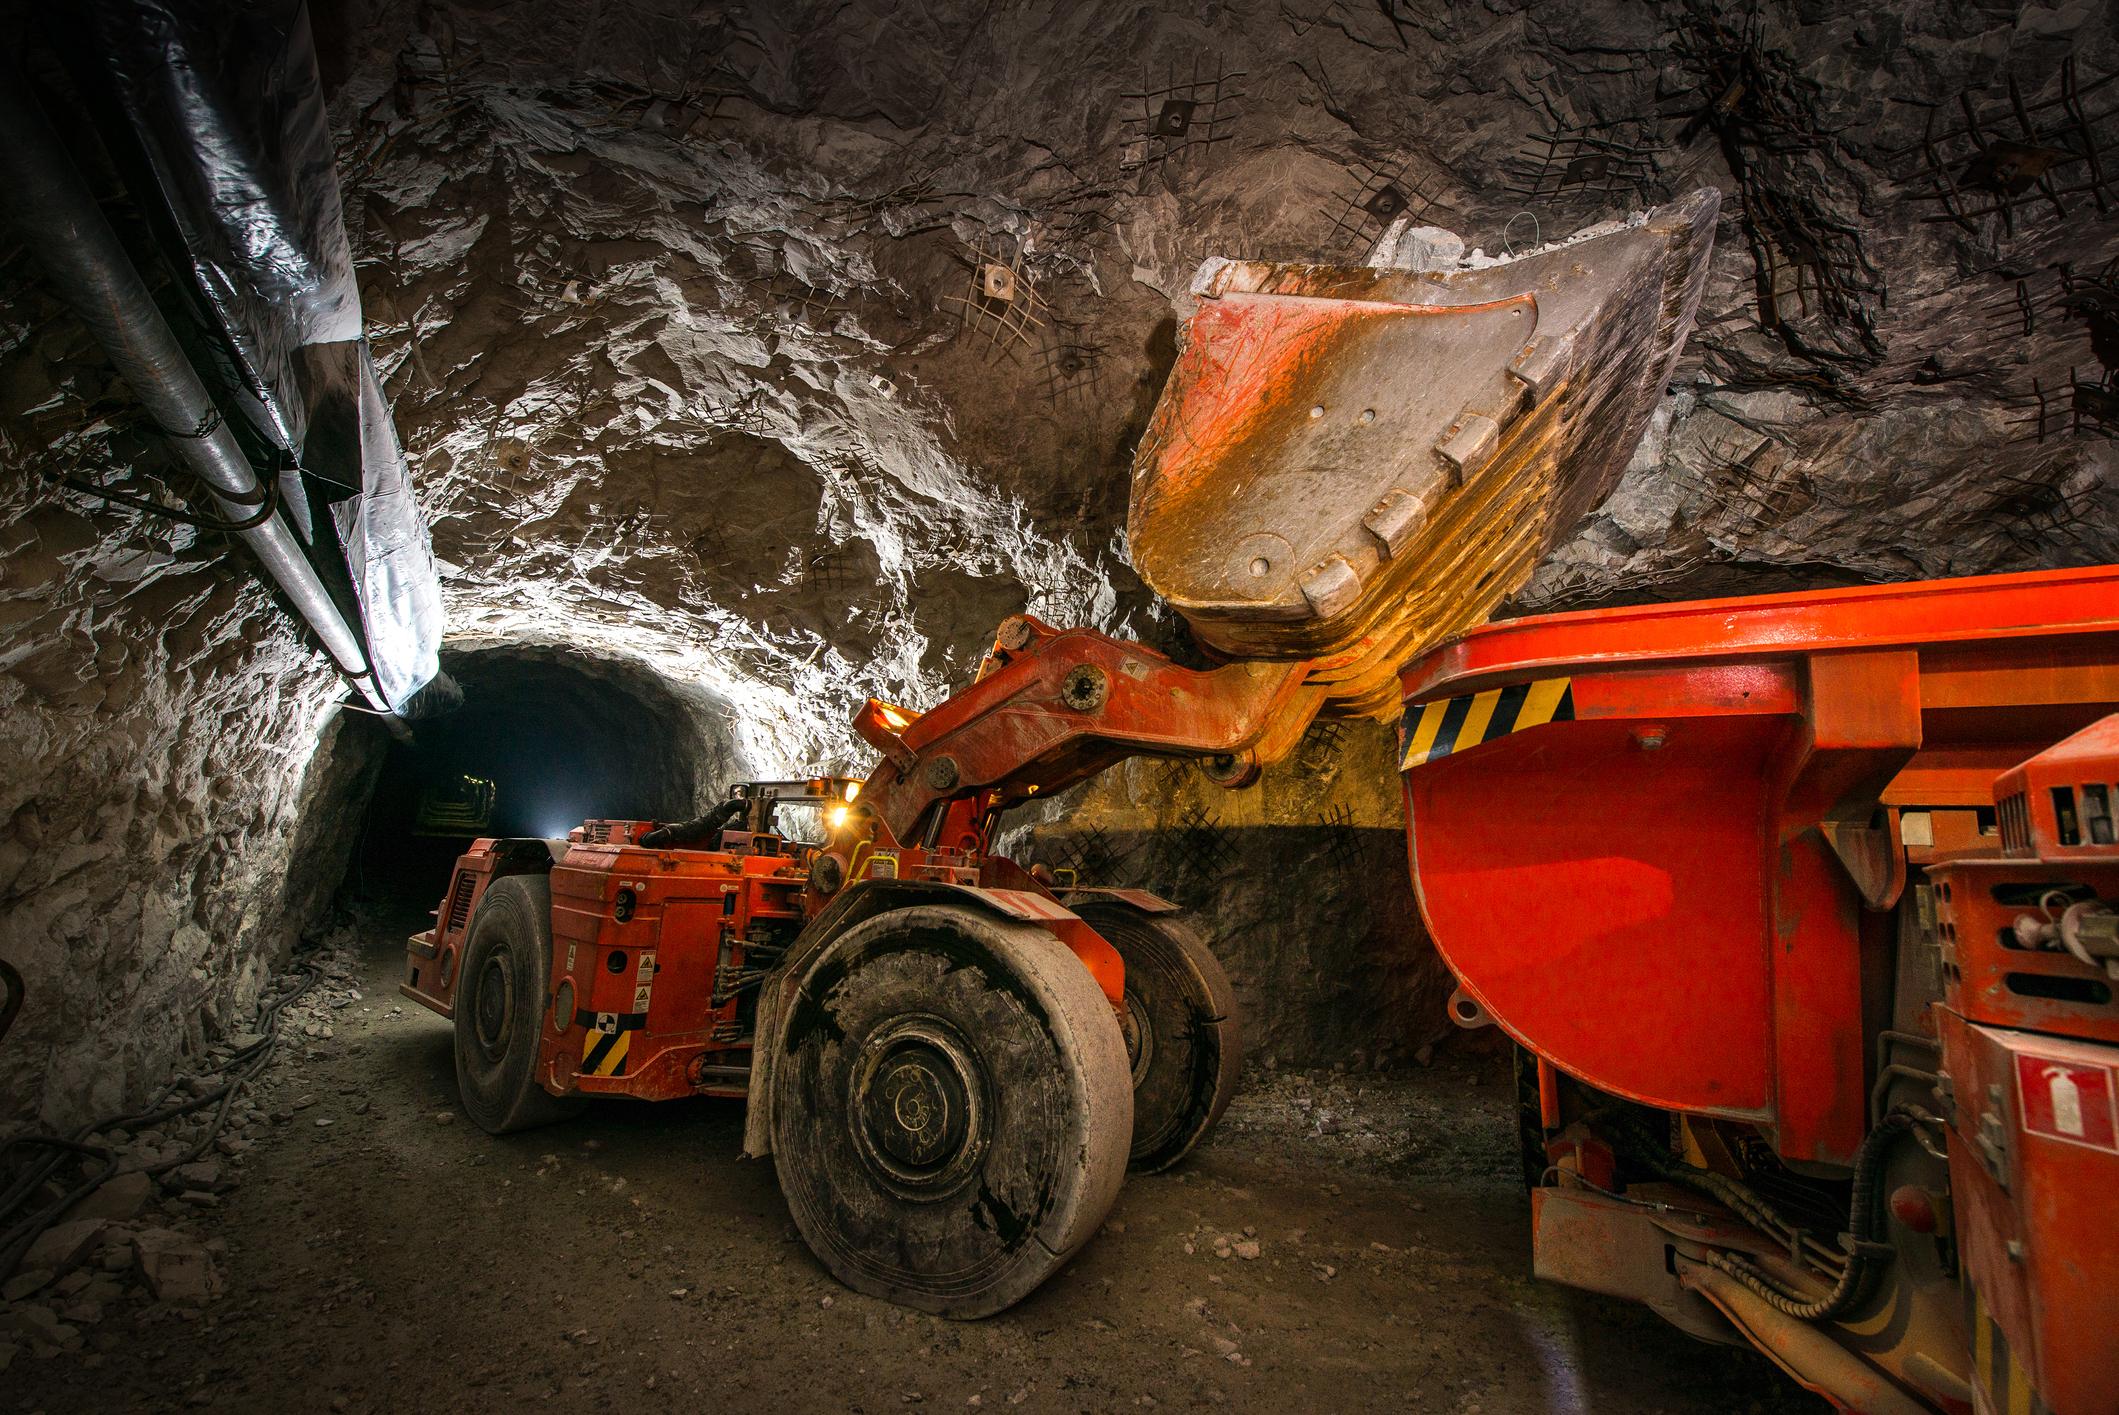 An excavator operating in an underground gold mine.